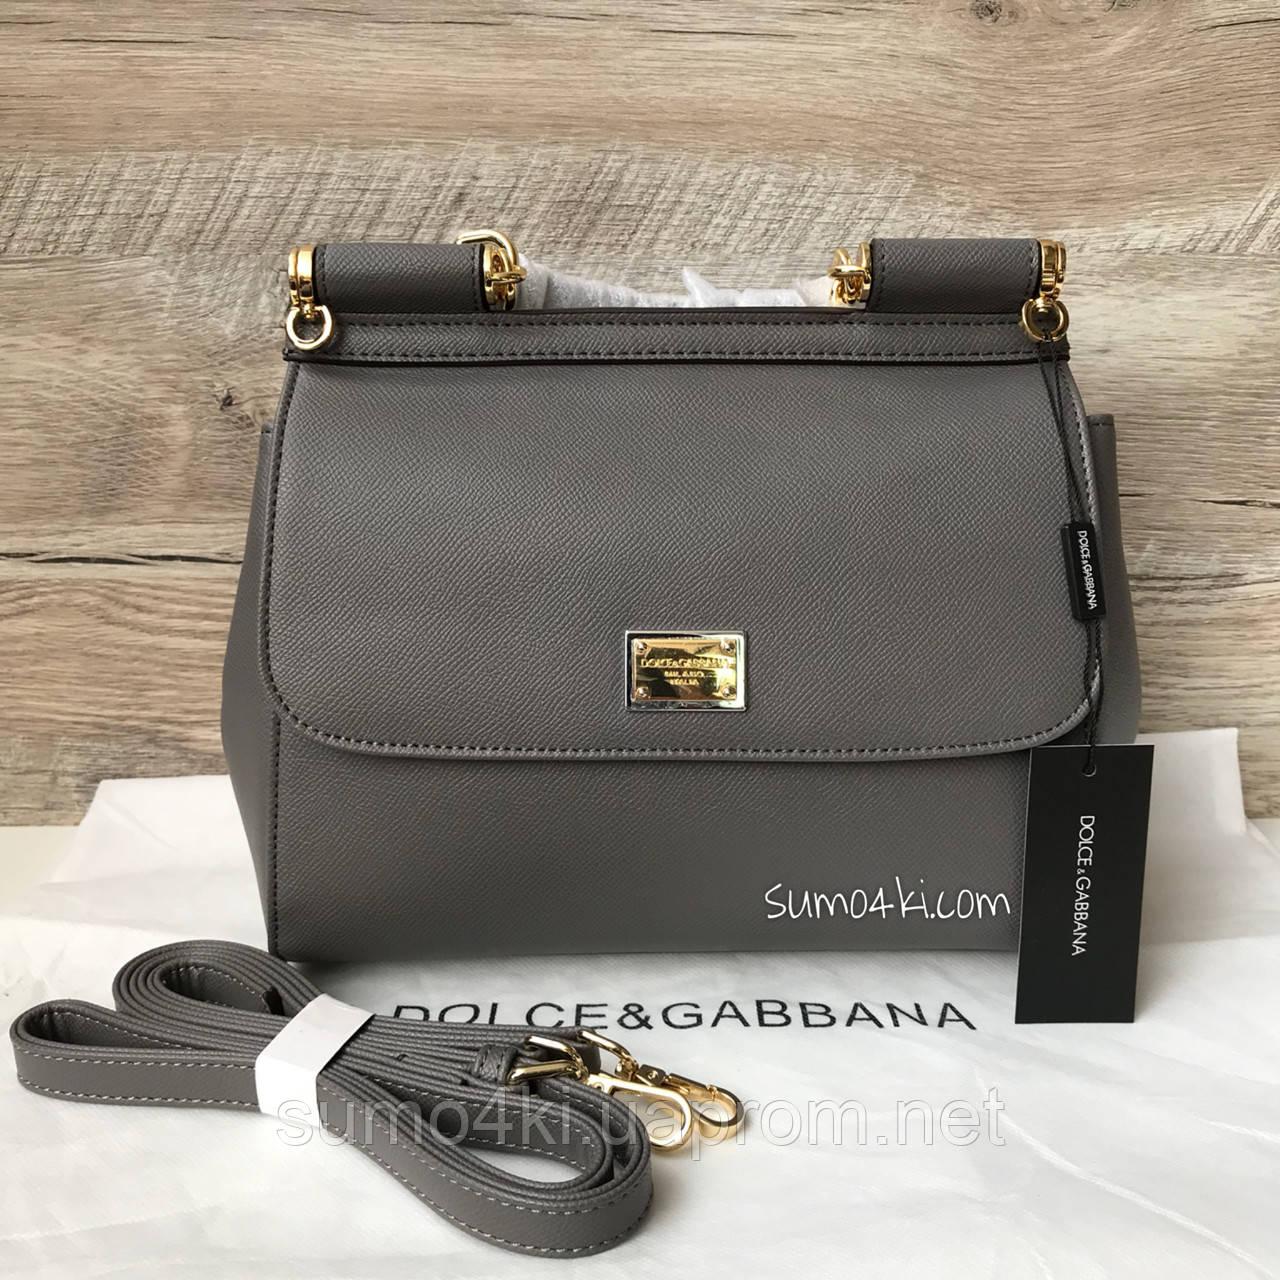 574a08b0471f Женская сумка Dolce & Gabbana Miss Sicily mini D&G - Интернет-магазин  «Галерея Сумок